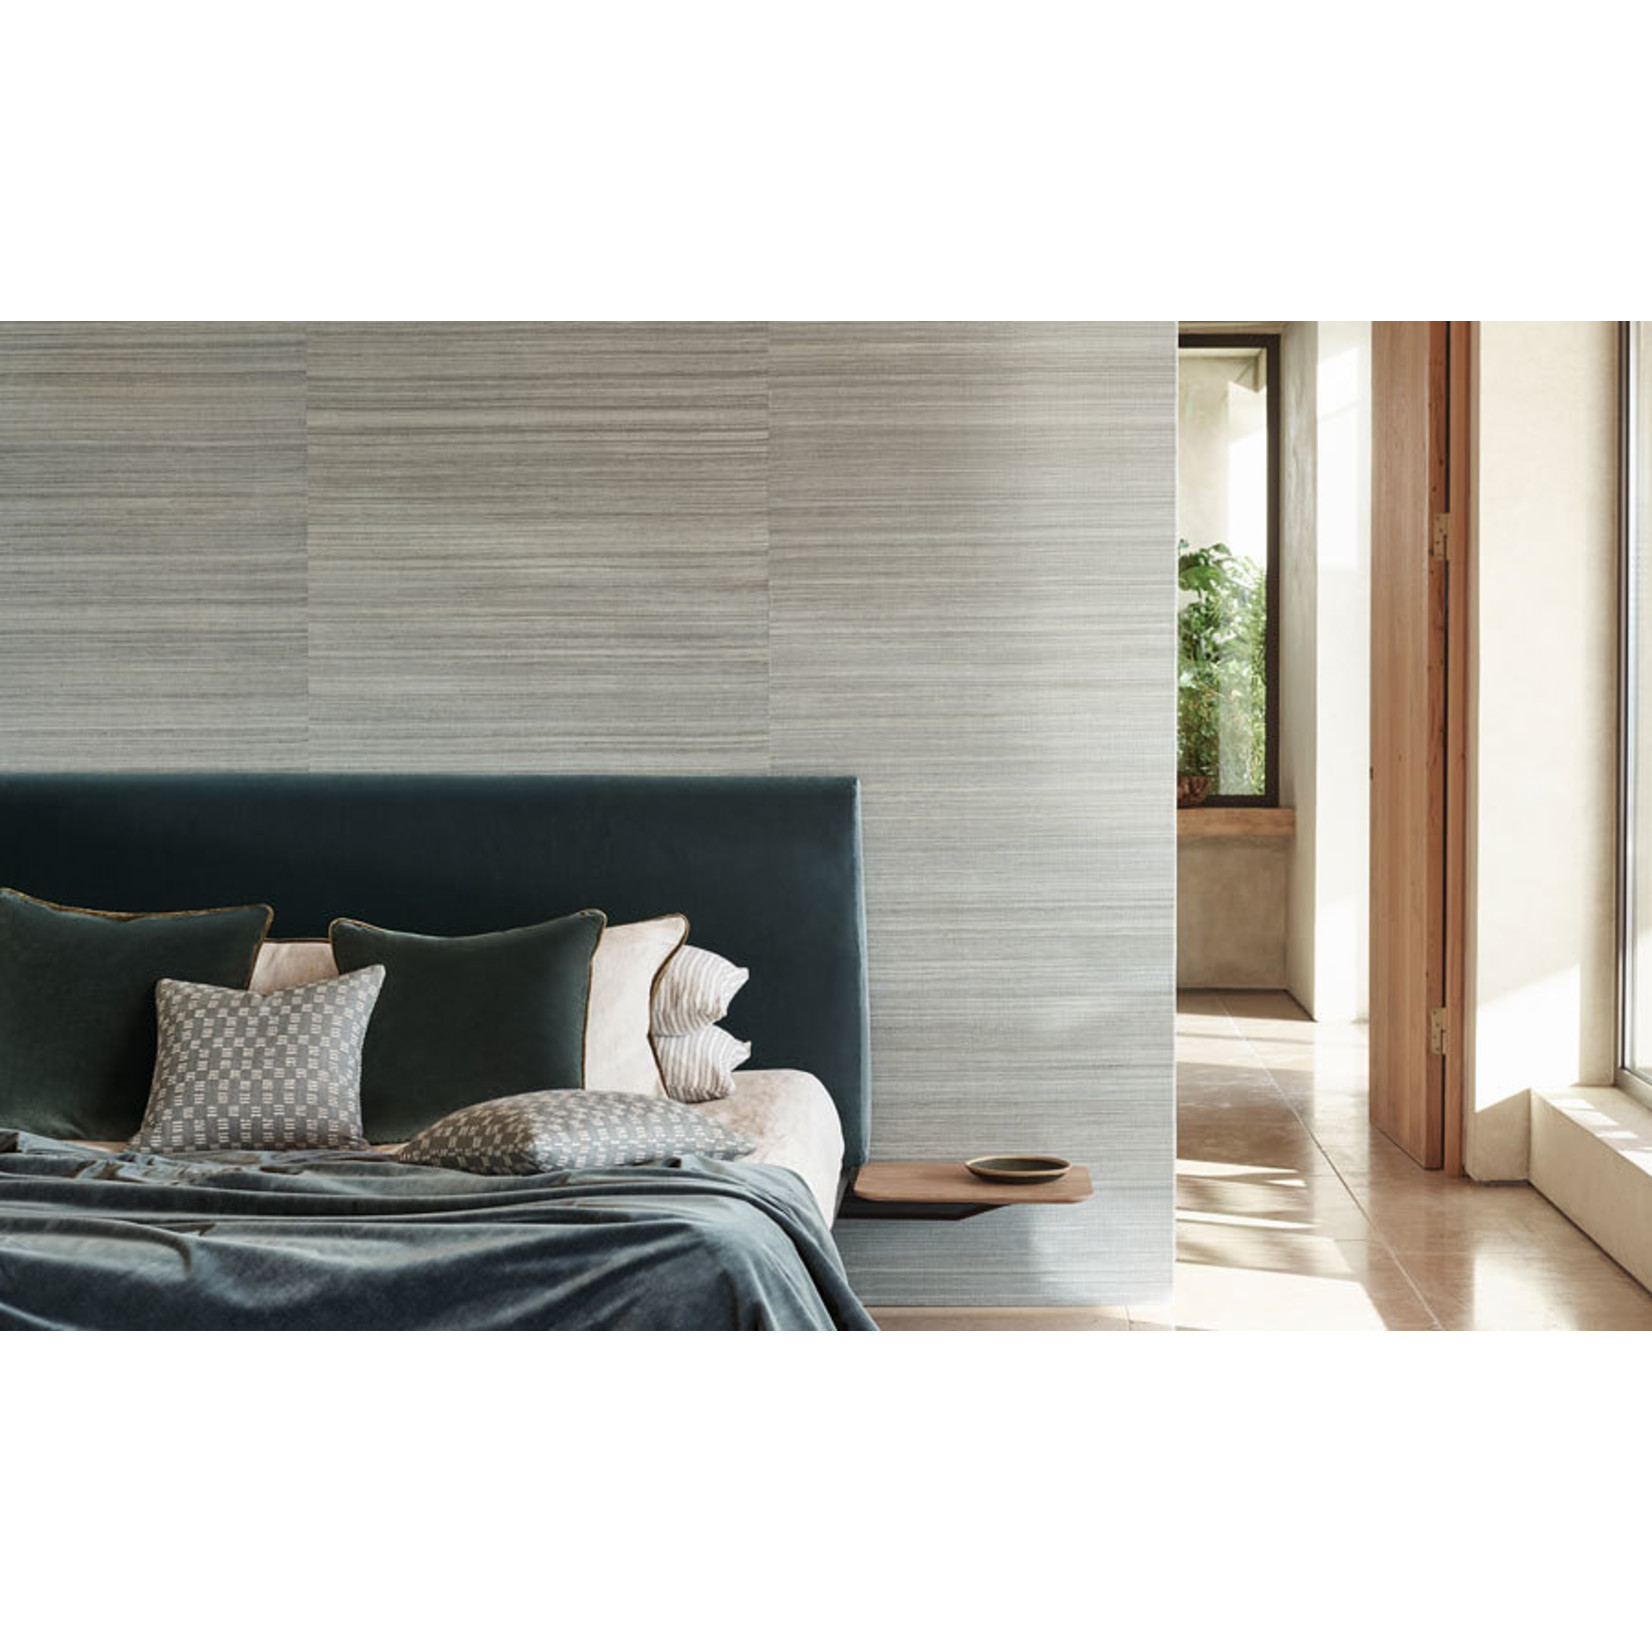 Mark Alexander Grasscloth Handwoven Wallcoverings | Duo Sisal Iznik